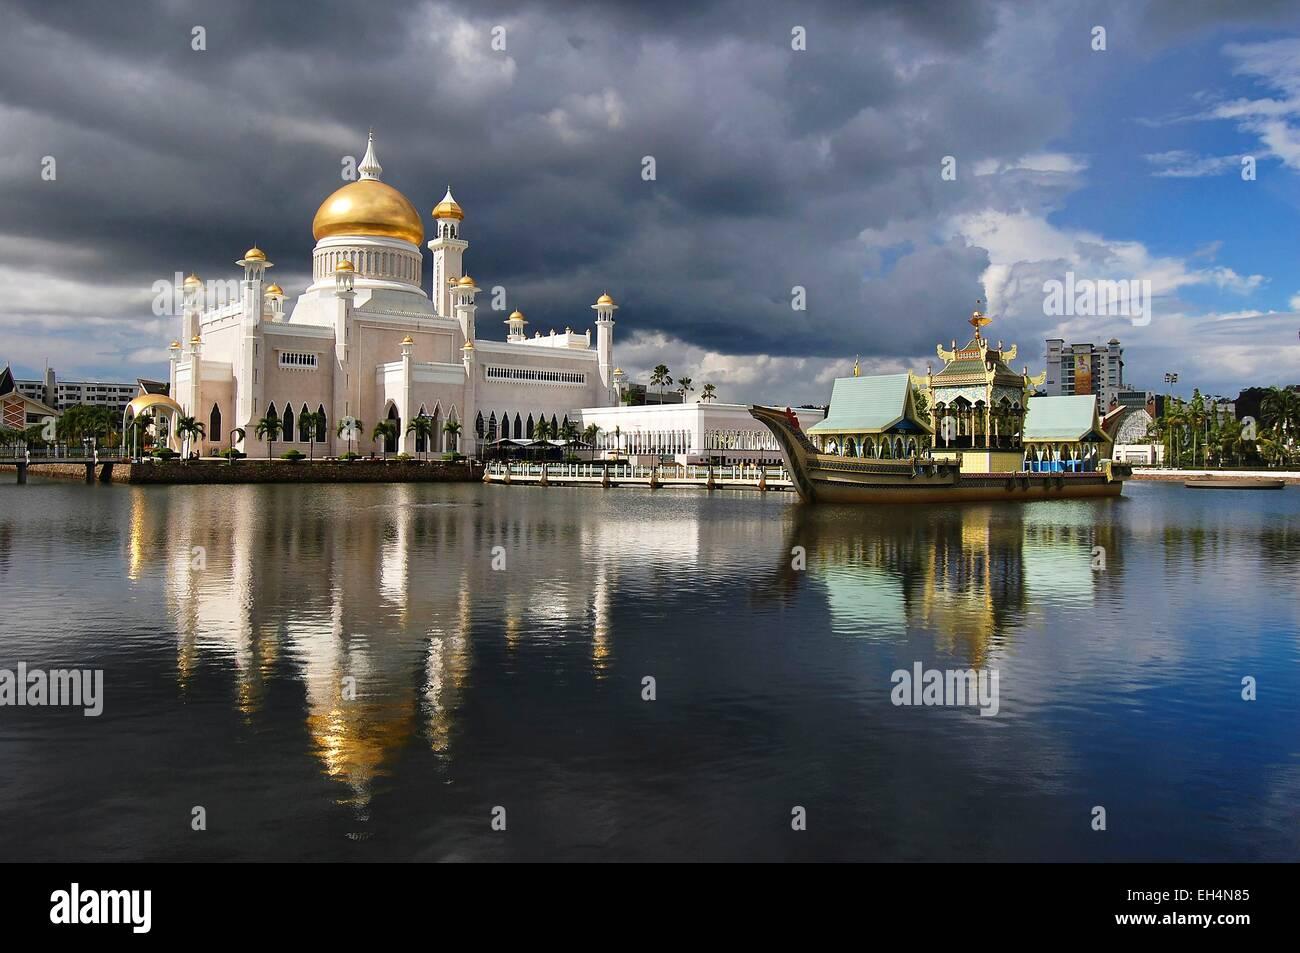 Brunei, Bandar Seri Begawan, Sultan Omar Ali Saifuddin Mosque - Stock Image